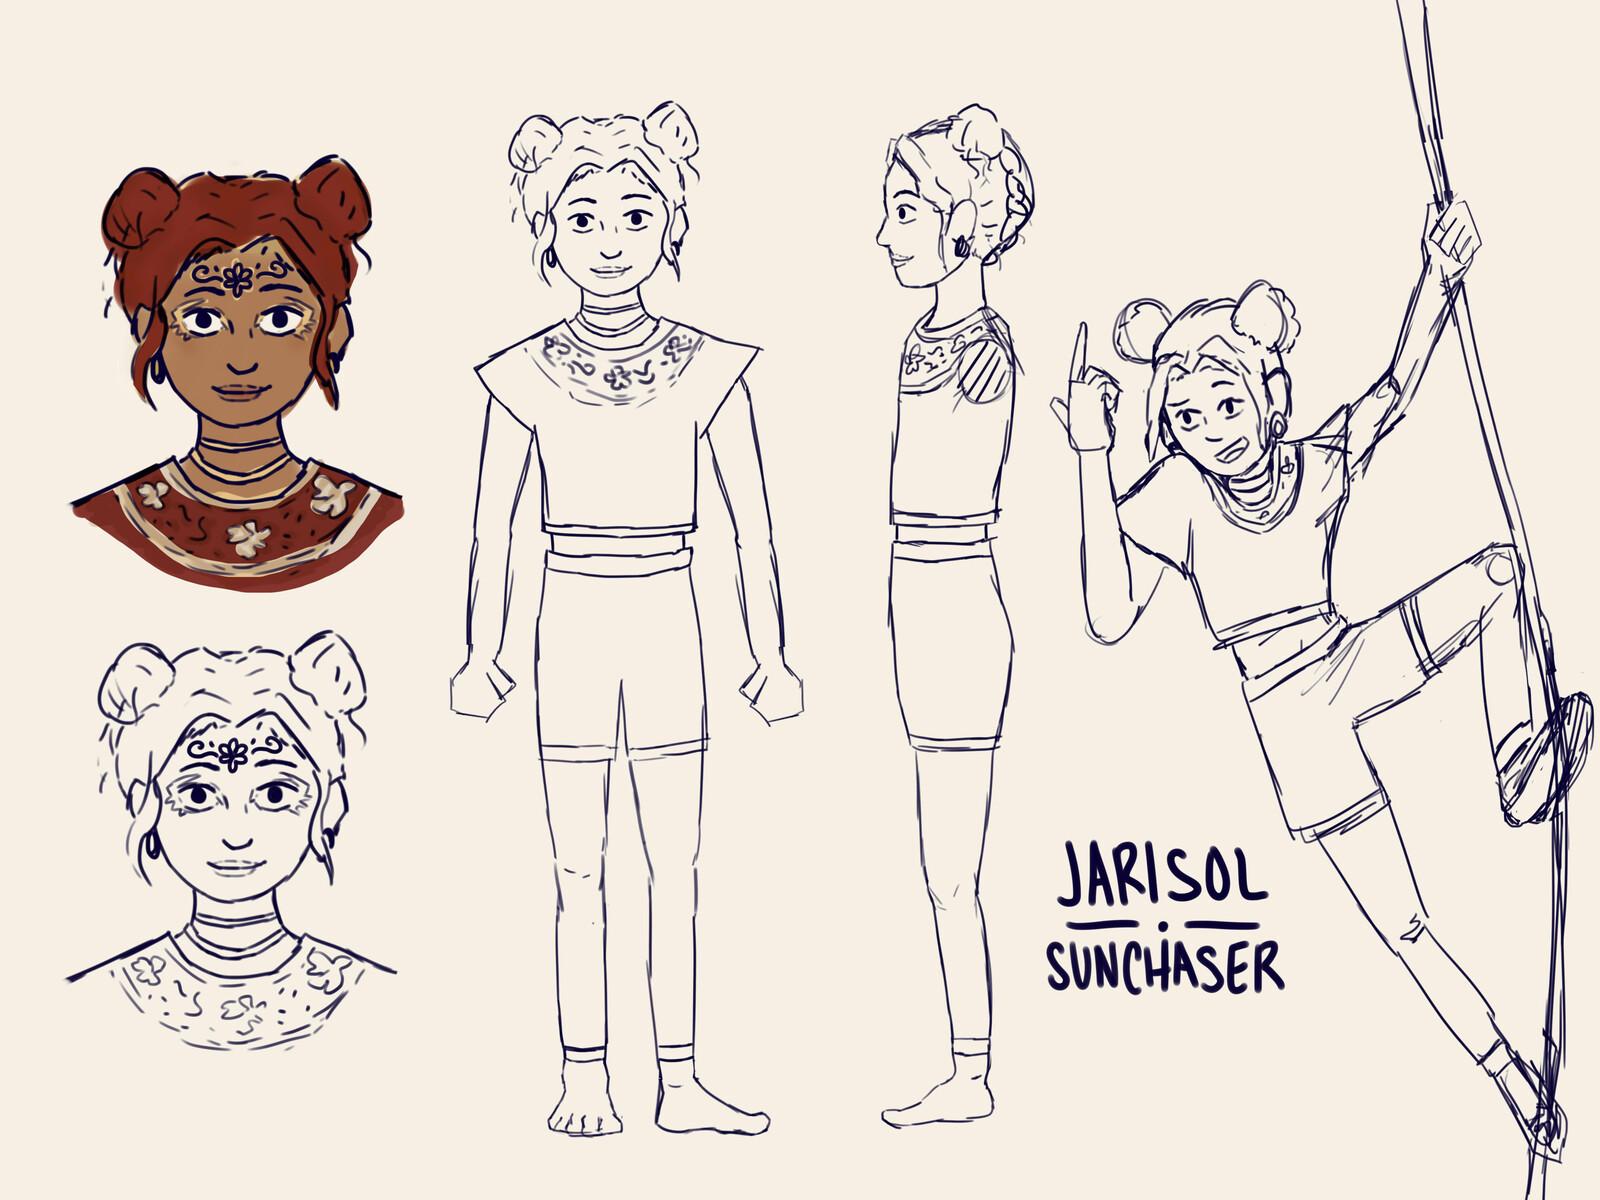 Initial character design